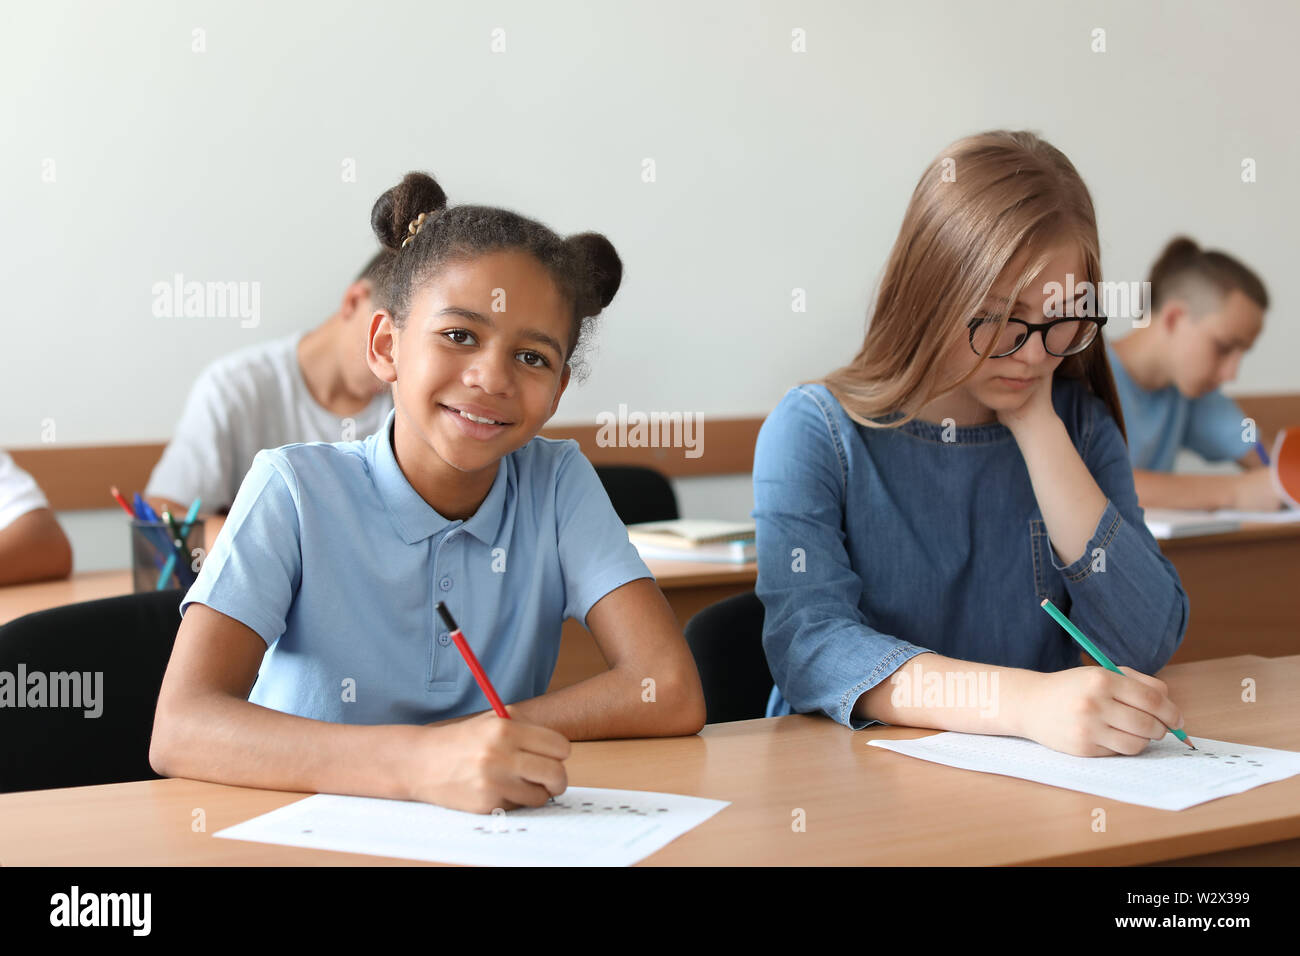 Teenage girls passing school test in classroom - Stock Image